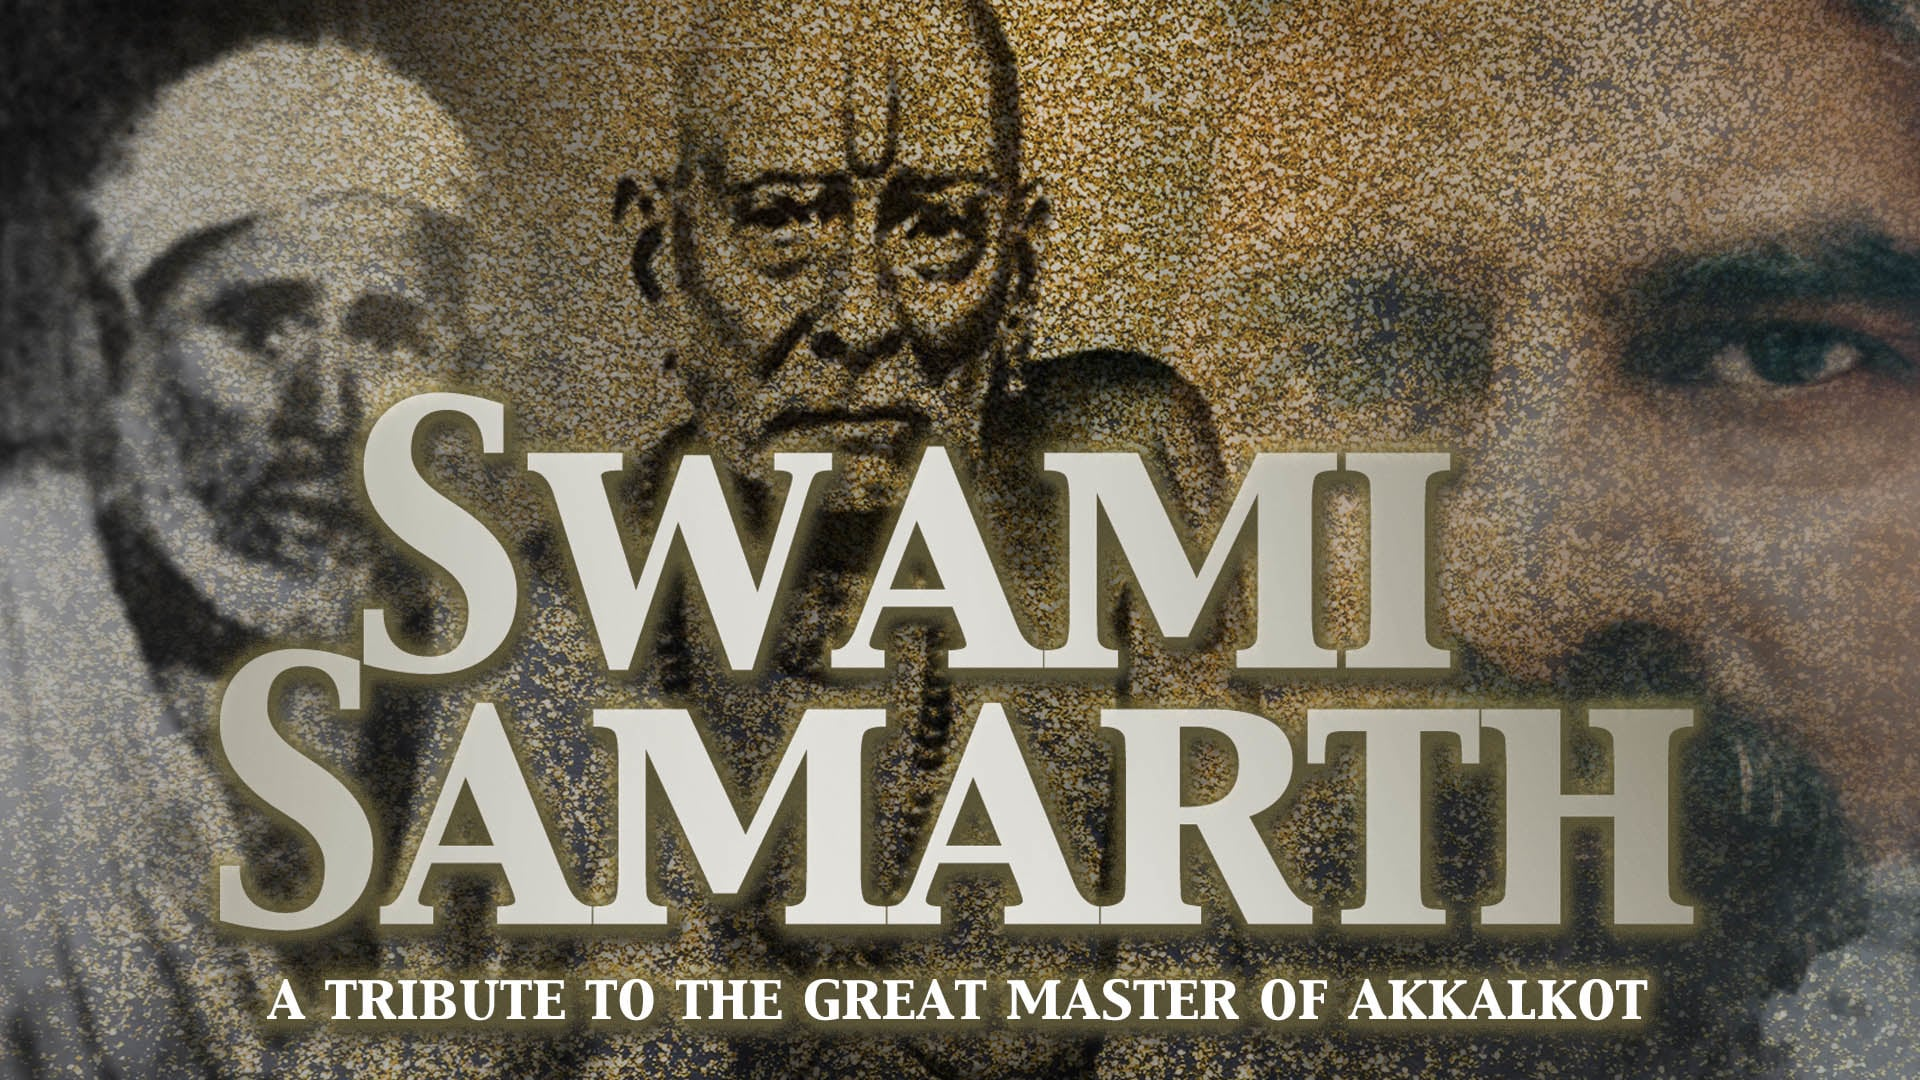 Swami Samarth of Akkalkot - a tribute